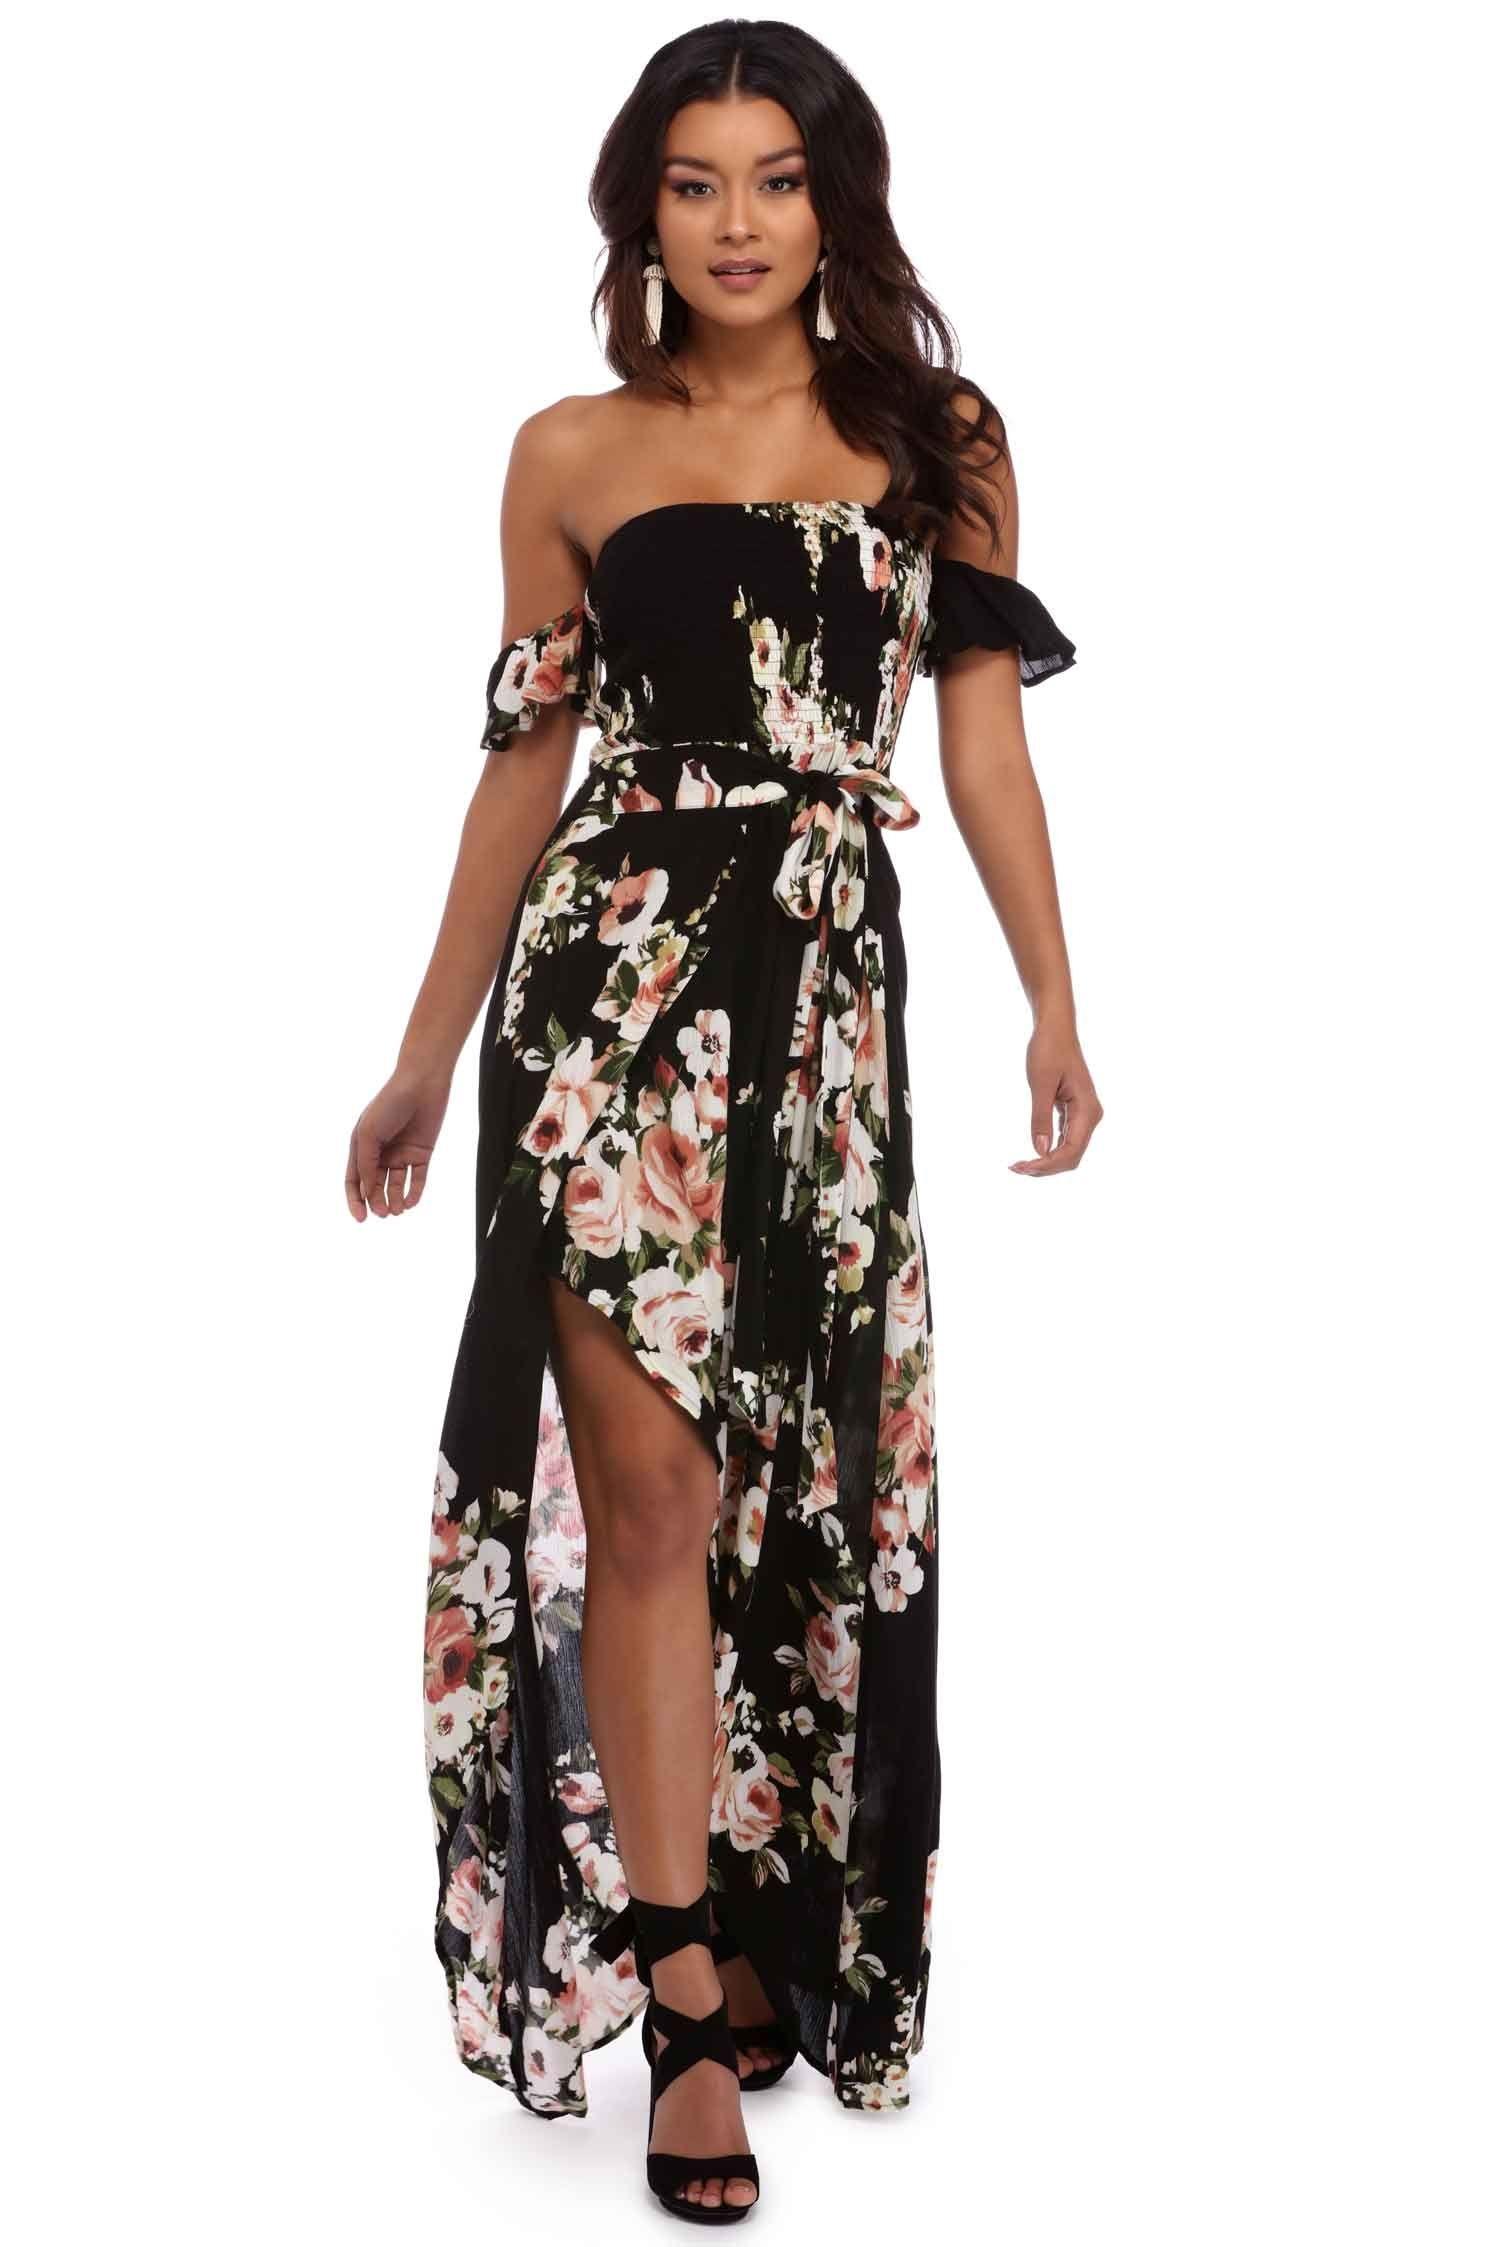 299ab12c5fcb Black Talk Smock Floral Dress